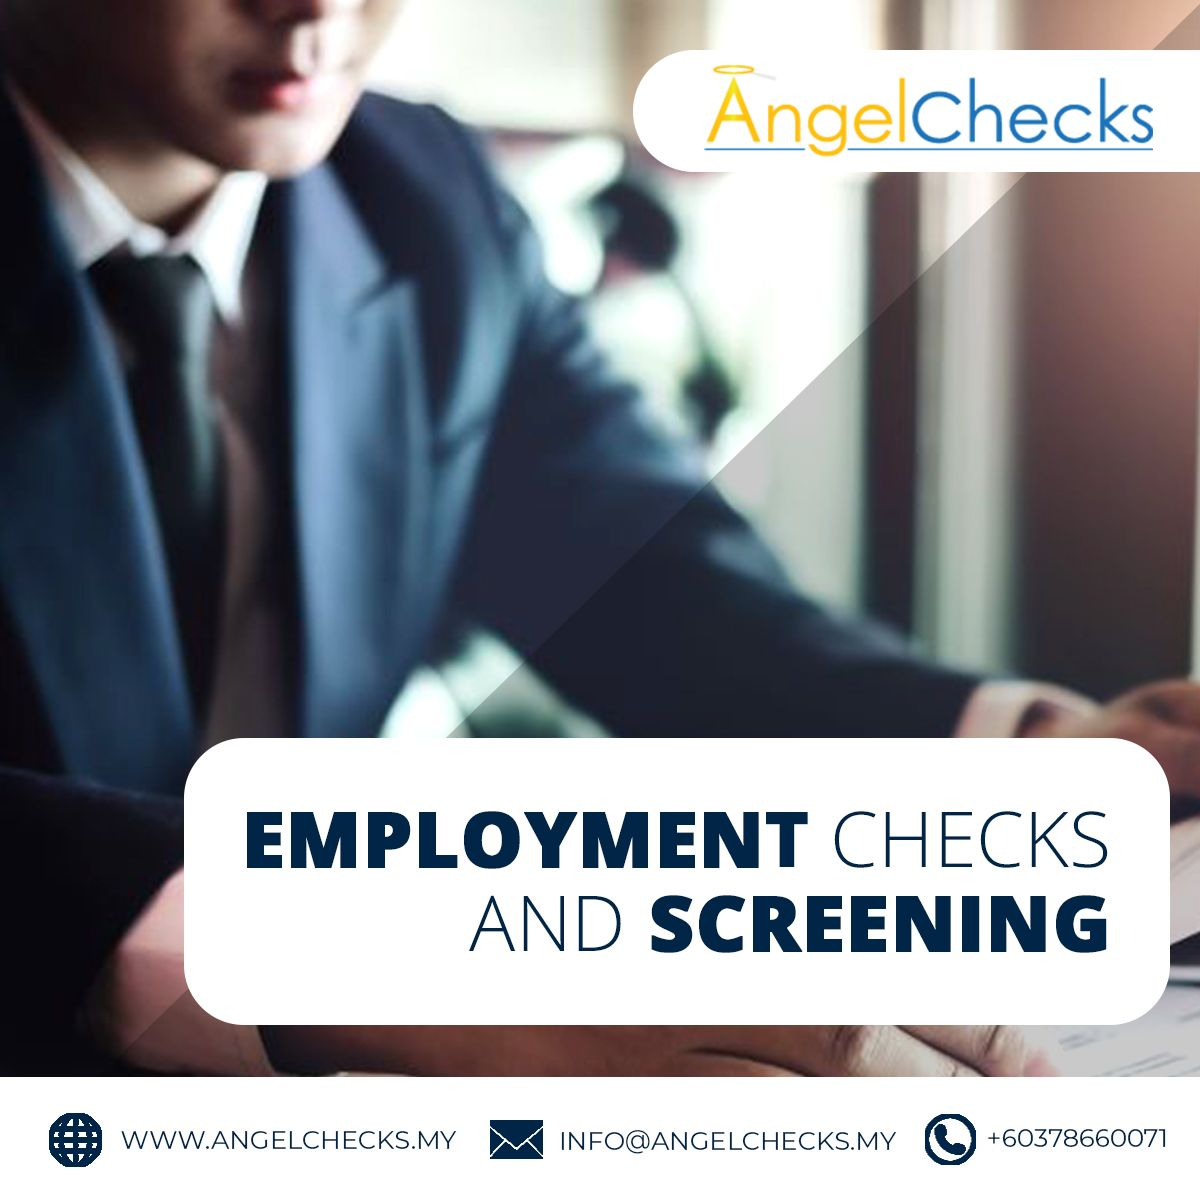 Employment Checks and Screening Employment background